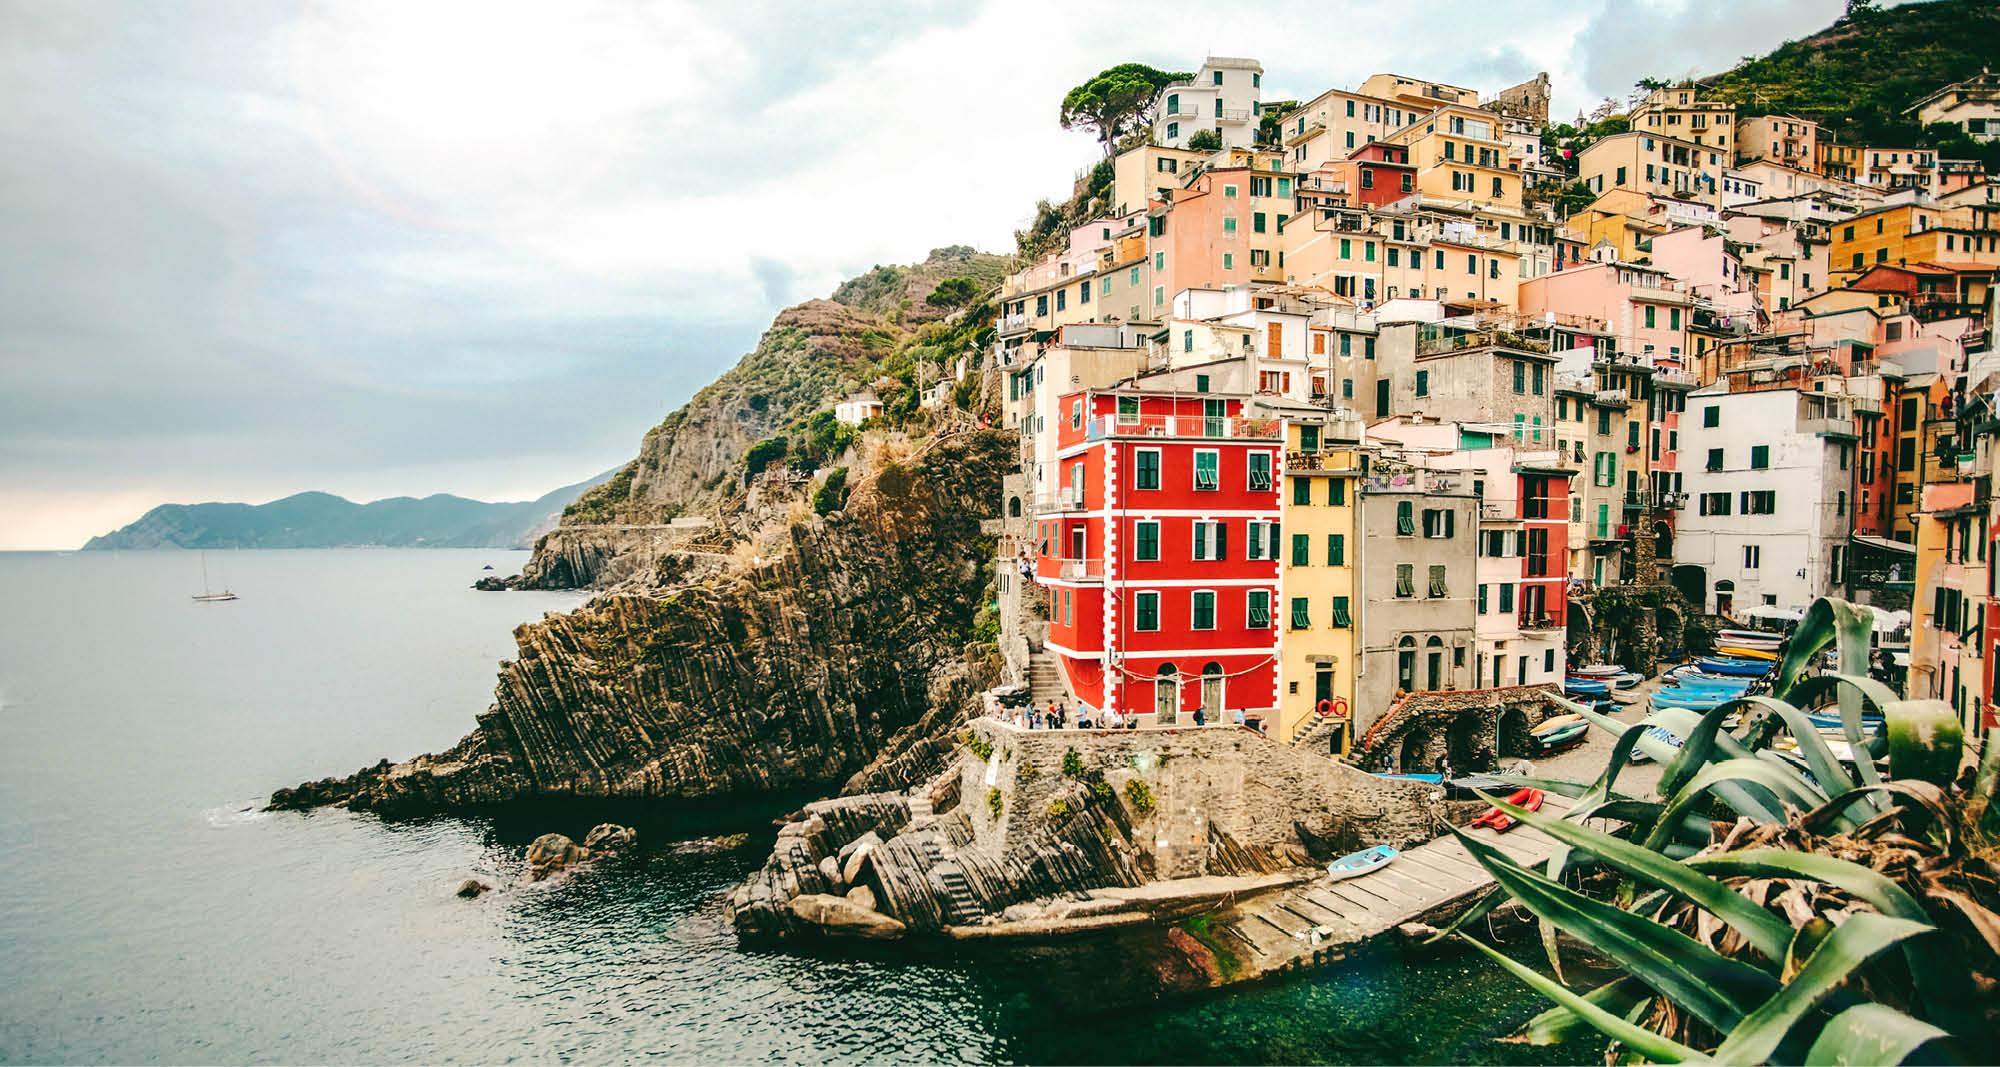 Dream-Maker-Travel-Greek-Islands-Cinque-Terre.jpg